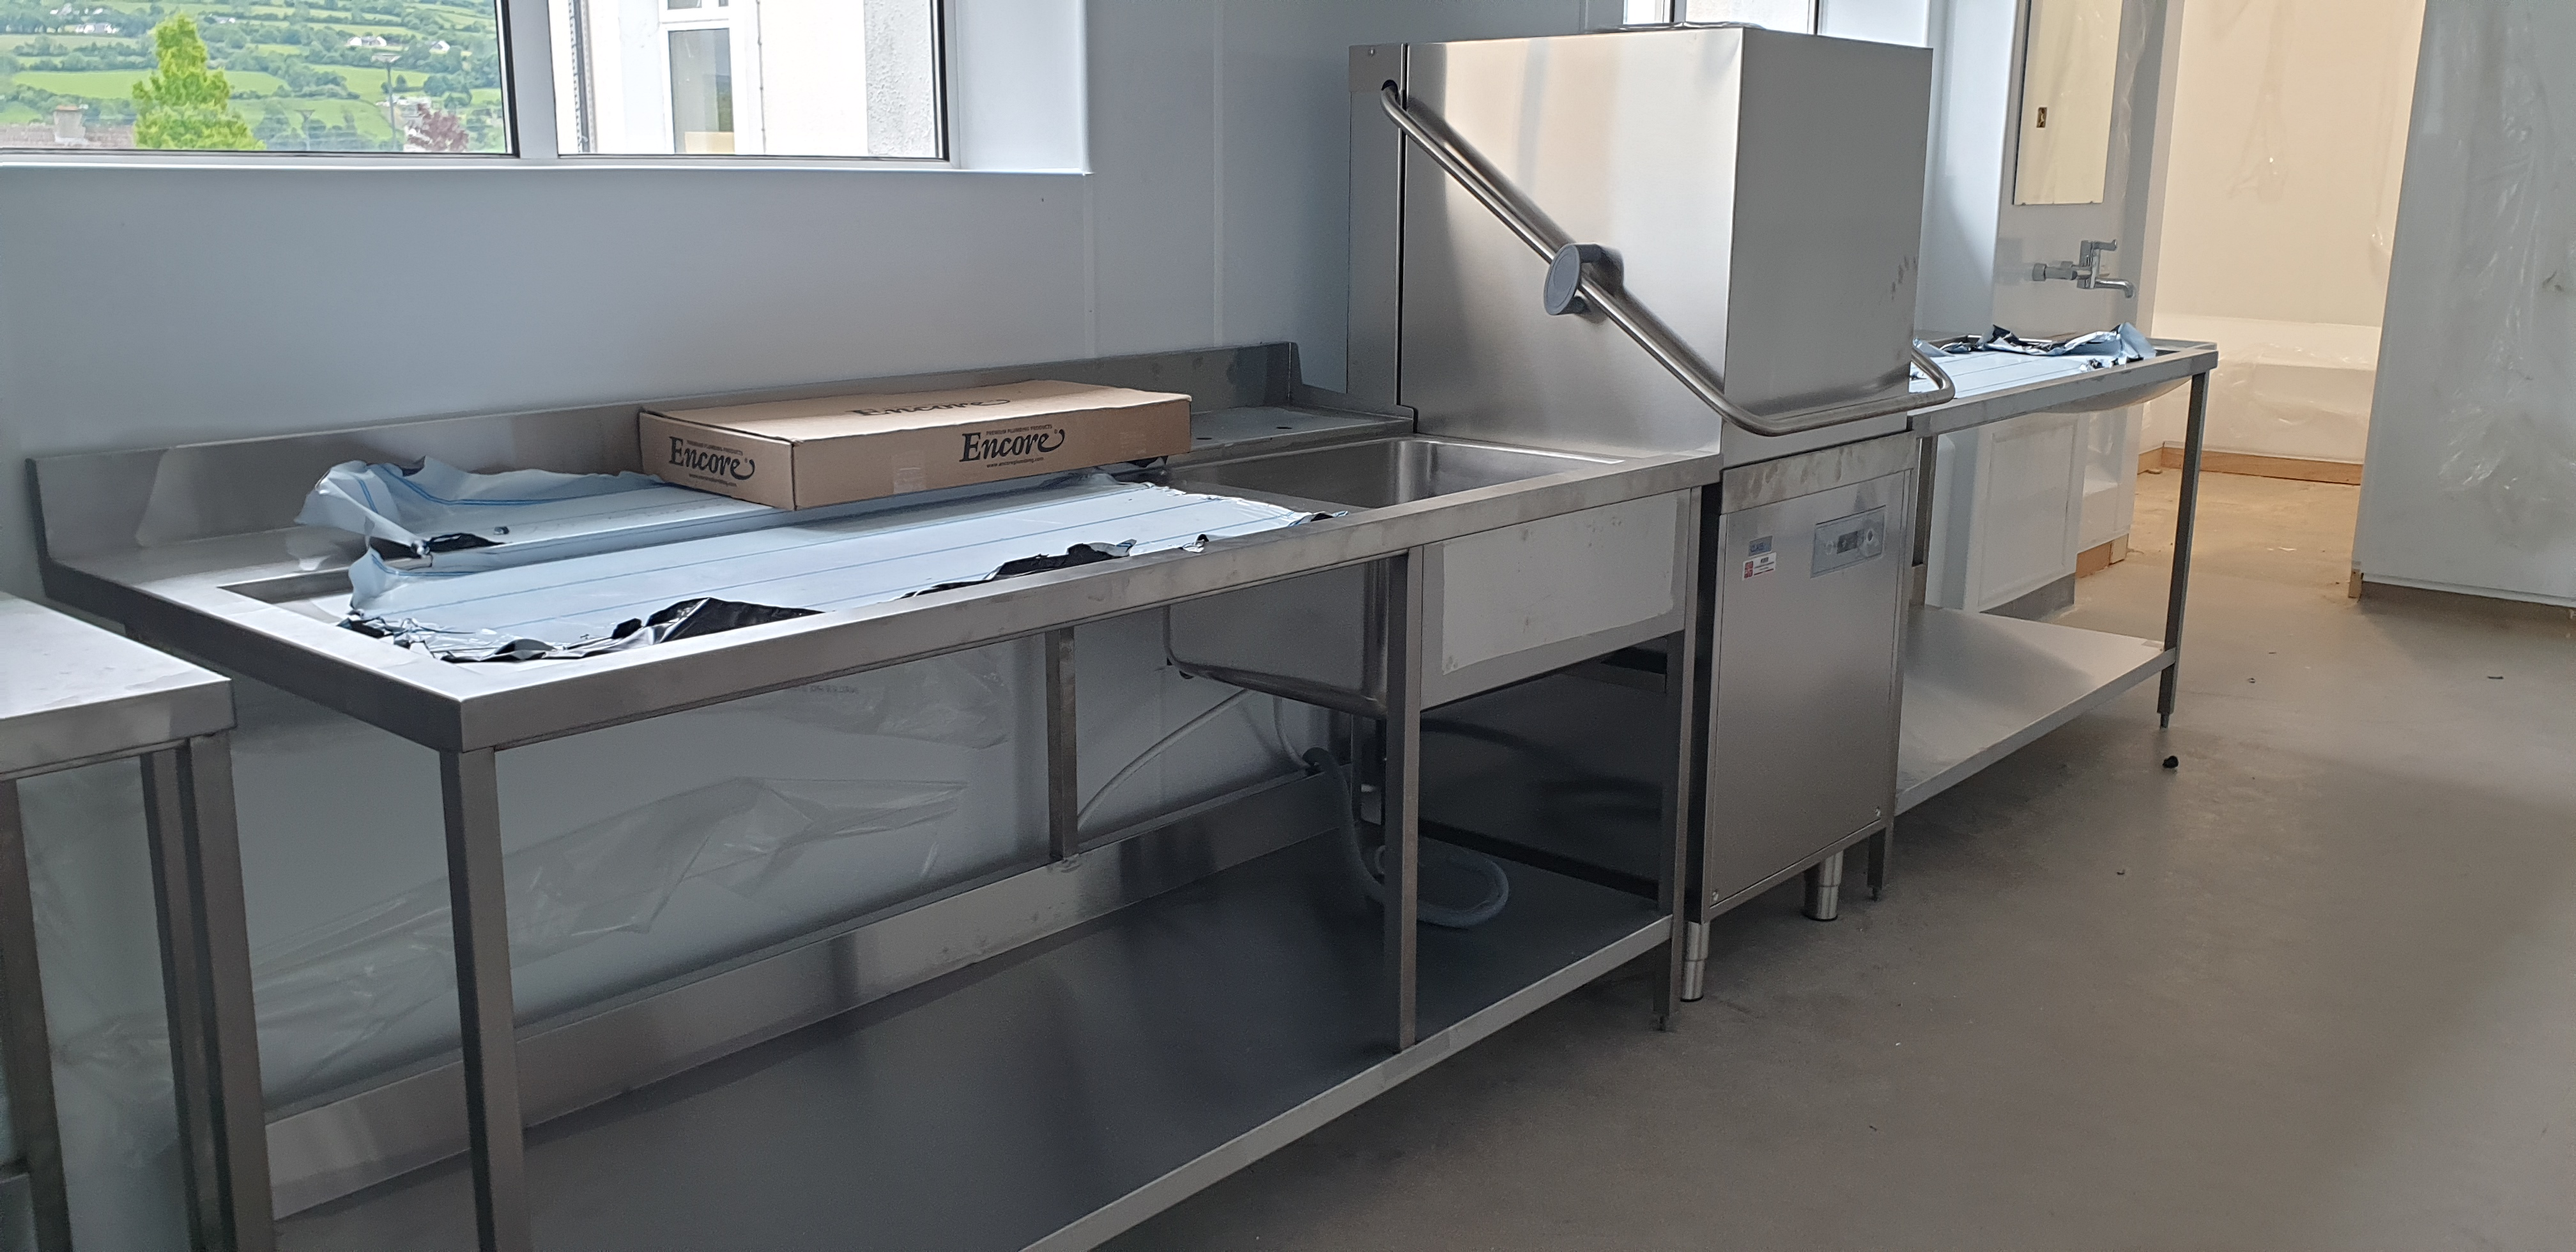 Classeq Dishwash Entry Table